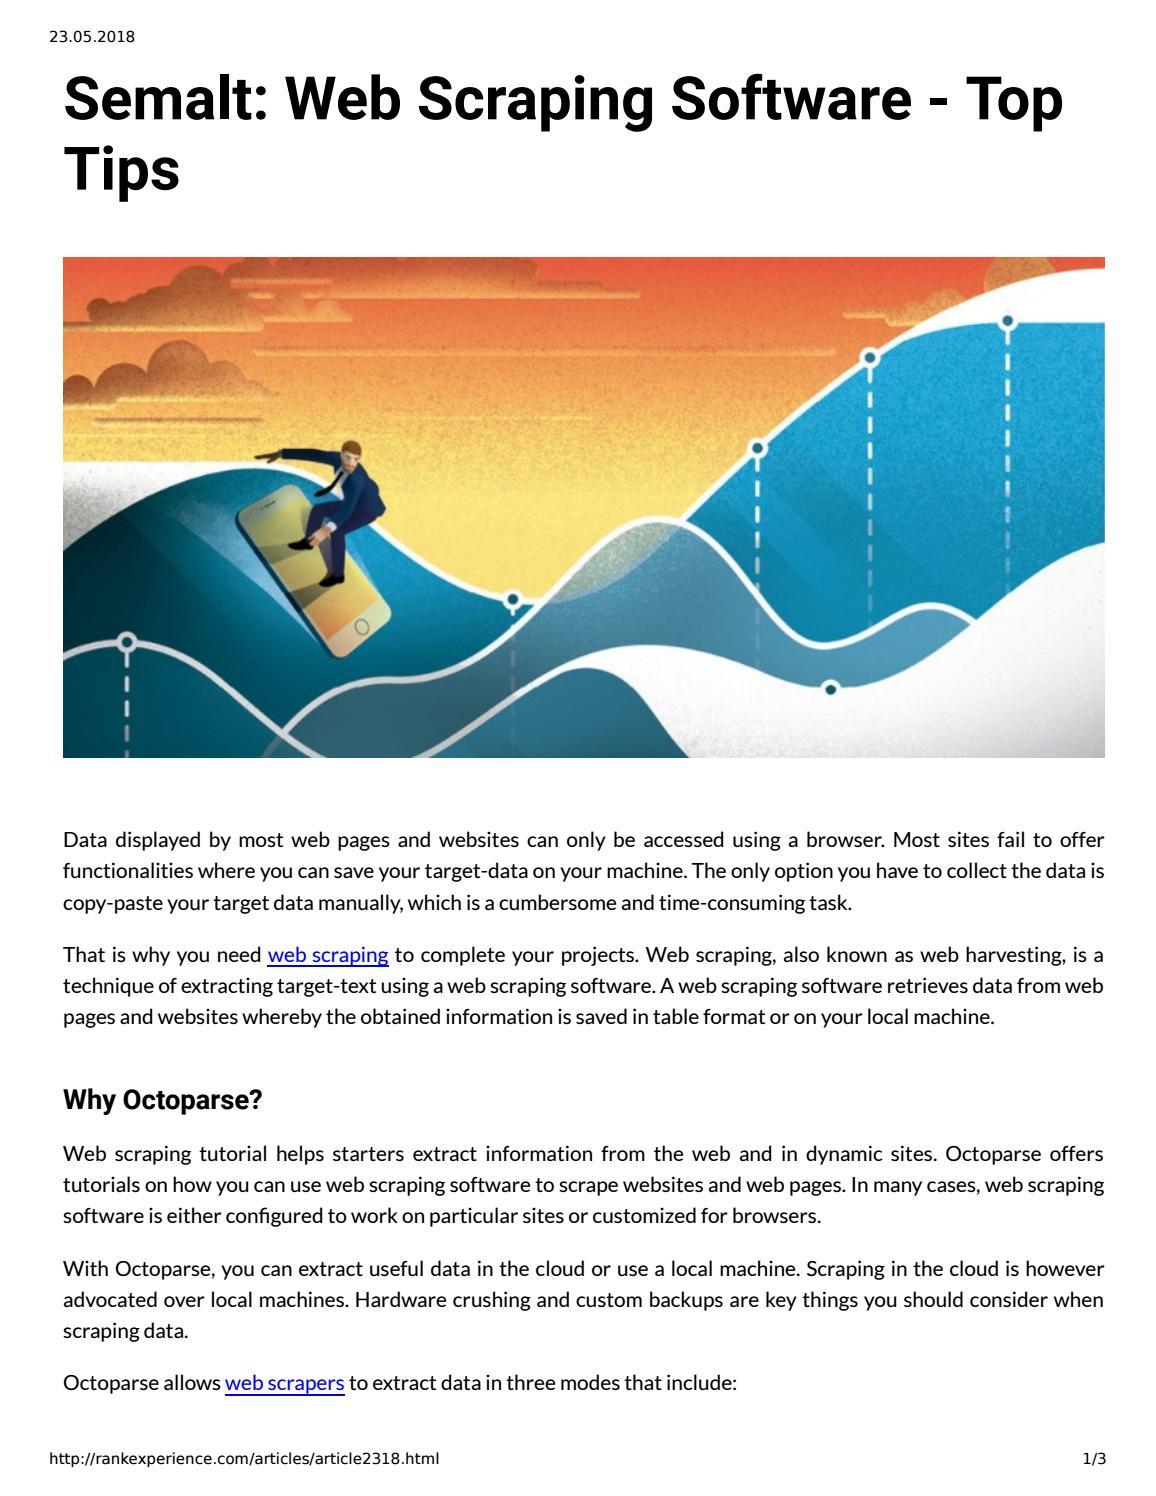 Semalt: Web Scraping Software - Top Tip by semaltcompany - issuu